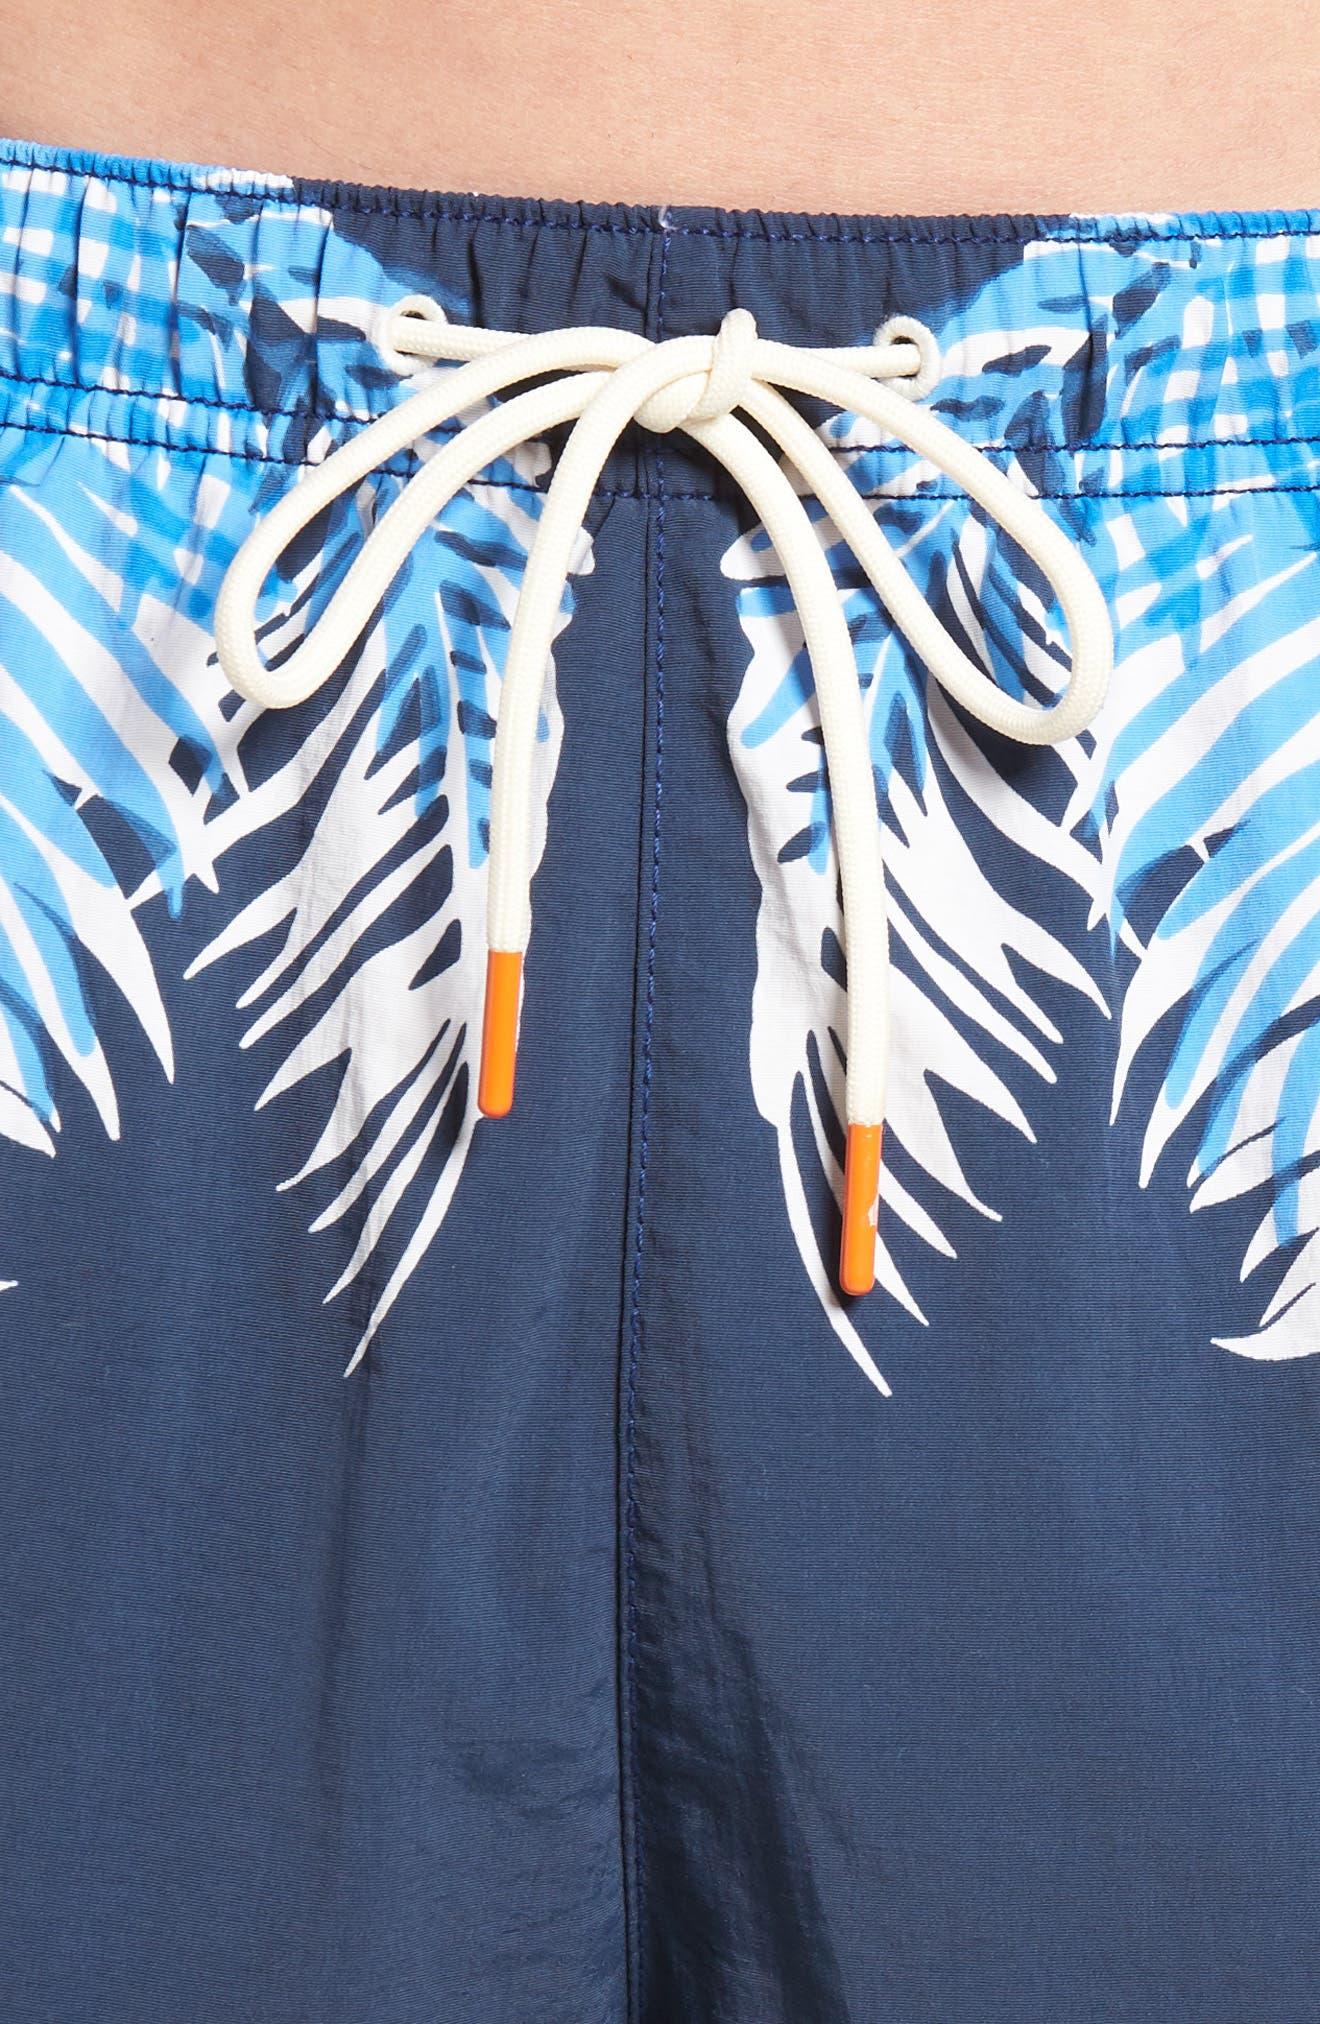 Naples Hacienda Board Shorts,                             Alternate thumbnail 4, color,                             OCEAN DEEP